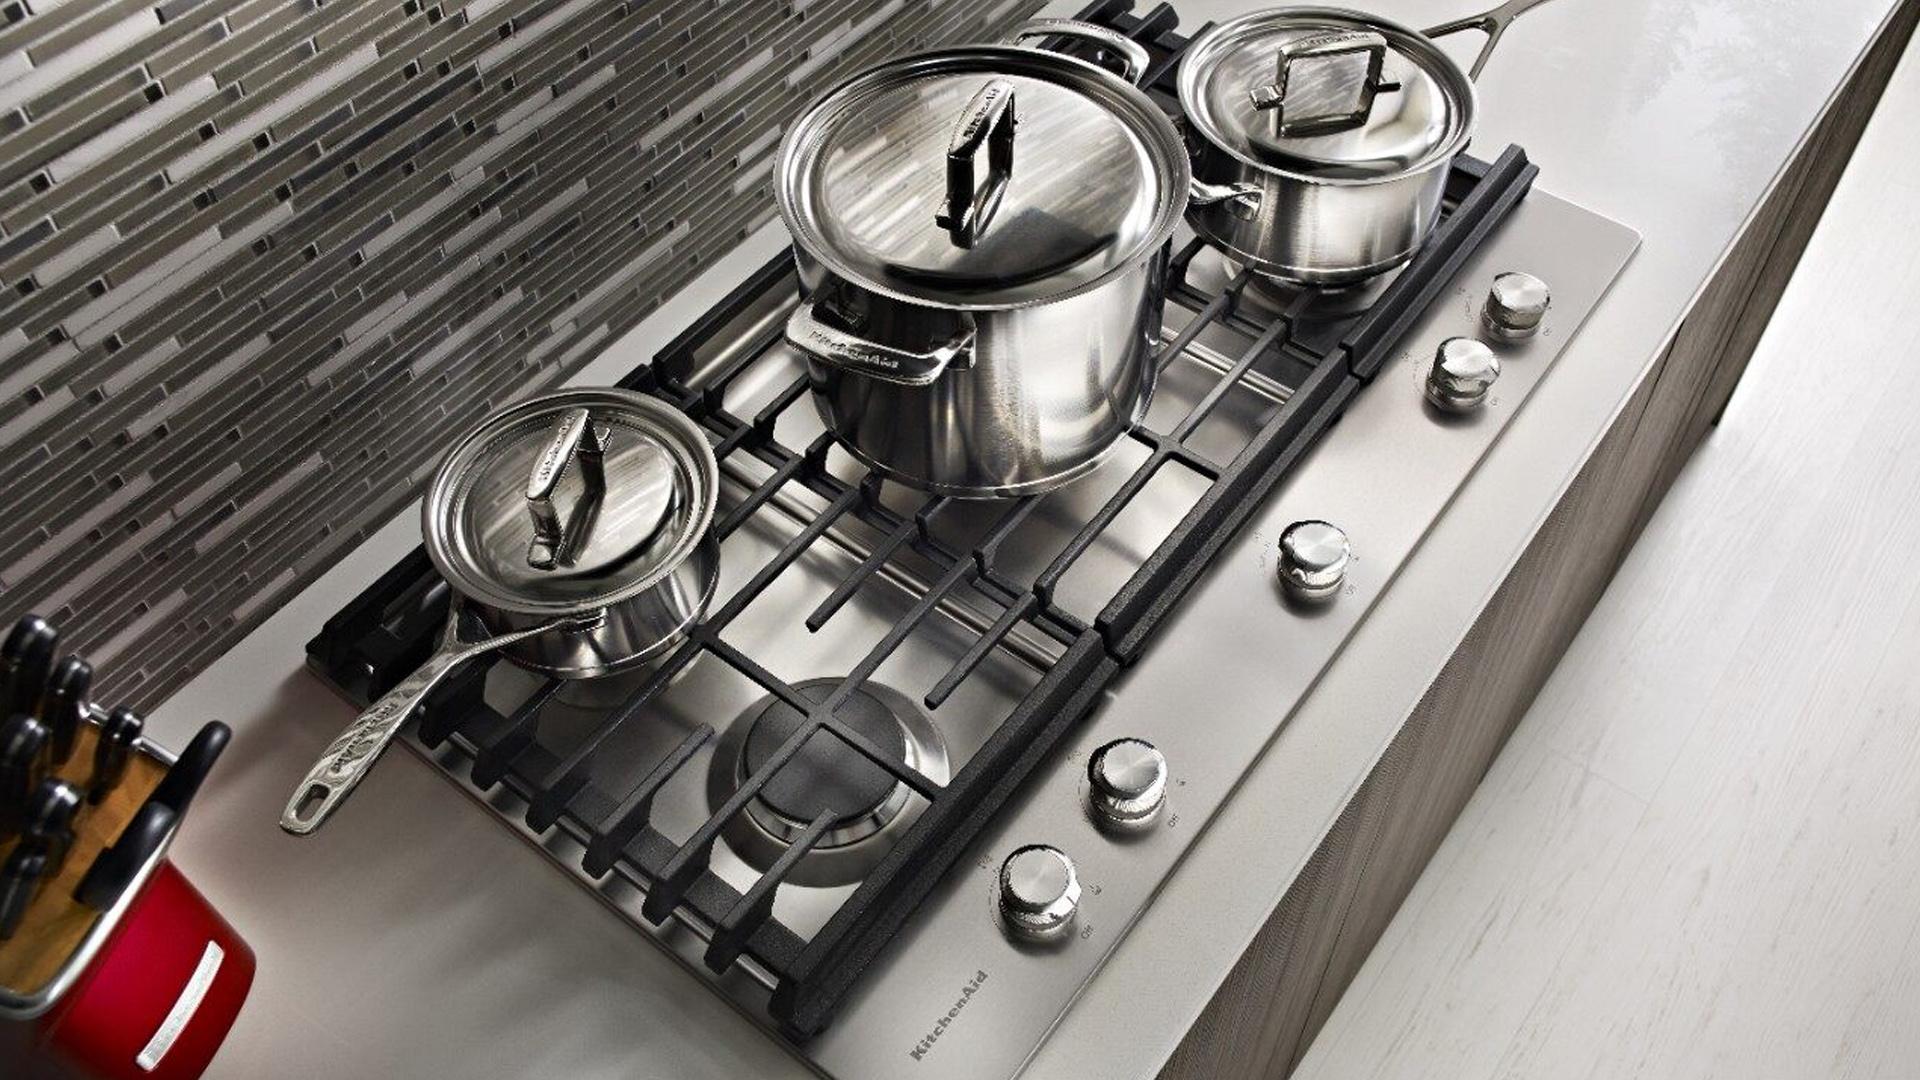 Kitchenaid Cooktop Repair | Kitchenaid Repairs